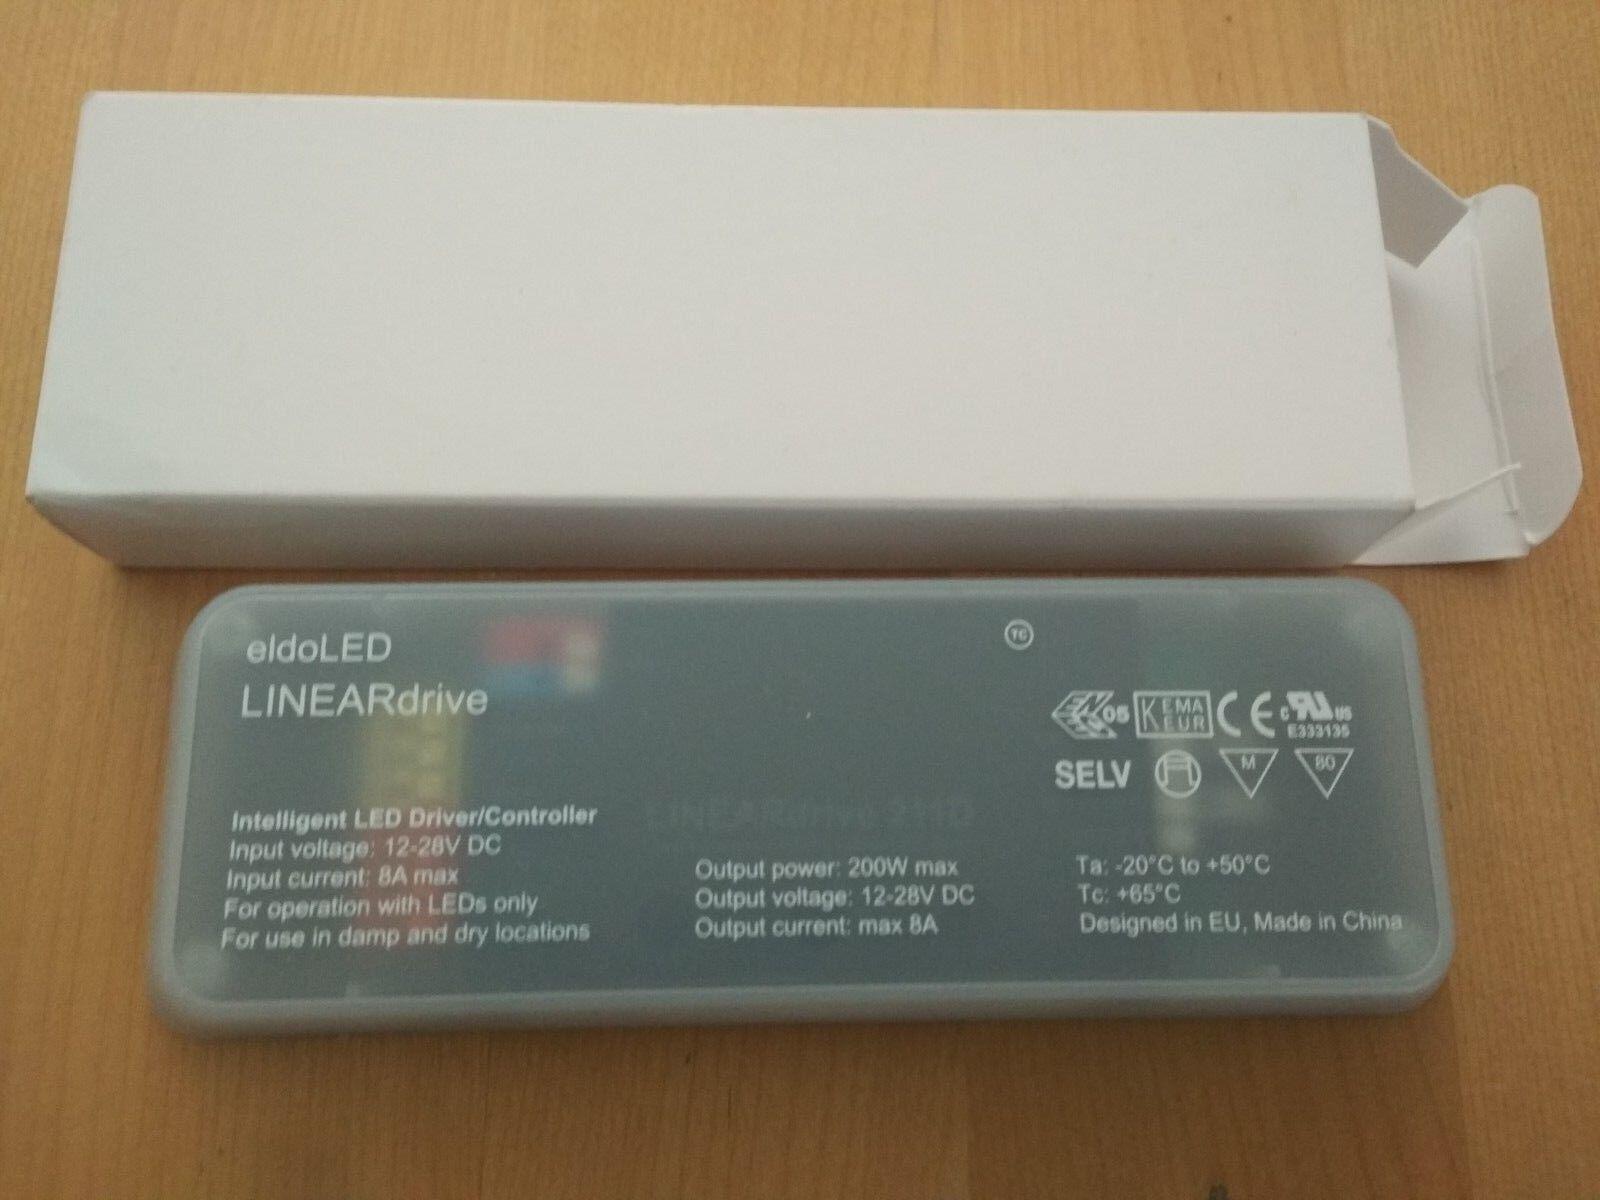 KNX eldoLED LIN211D1-LN, Constant Voltage 0-10 V Driver domotica